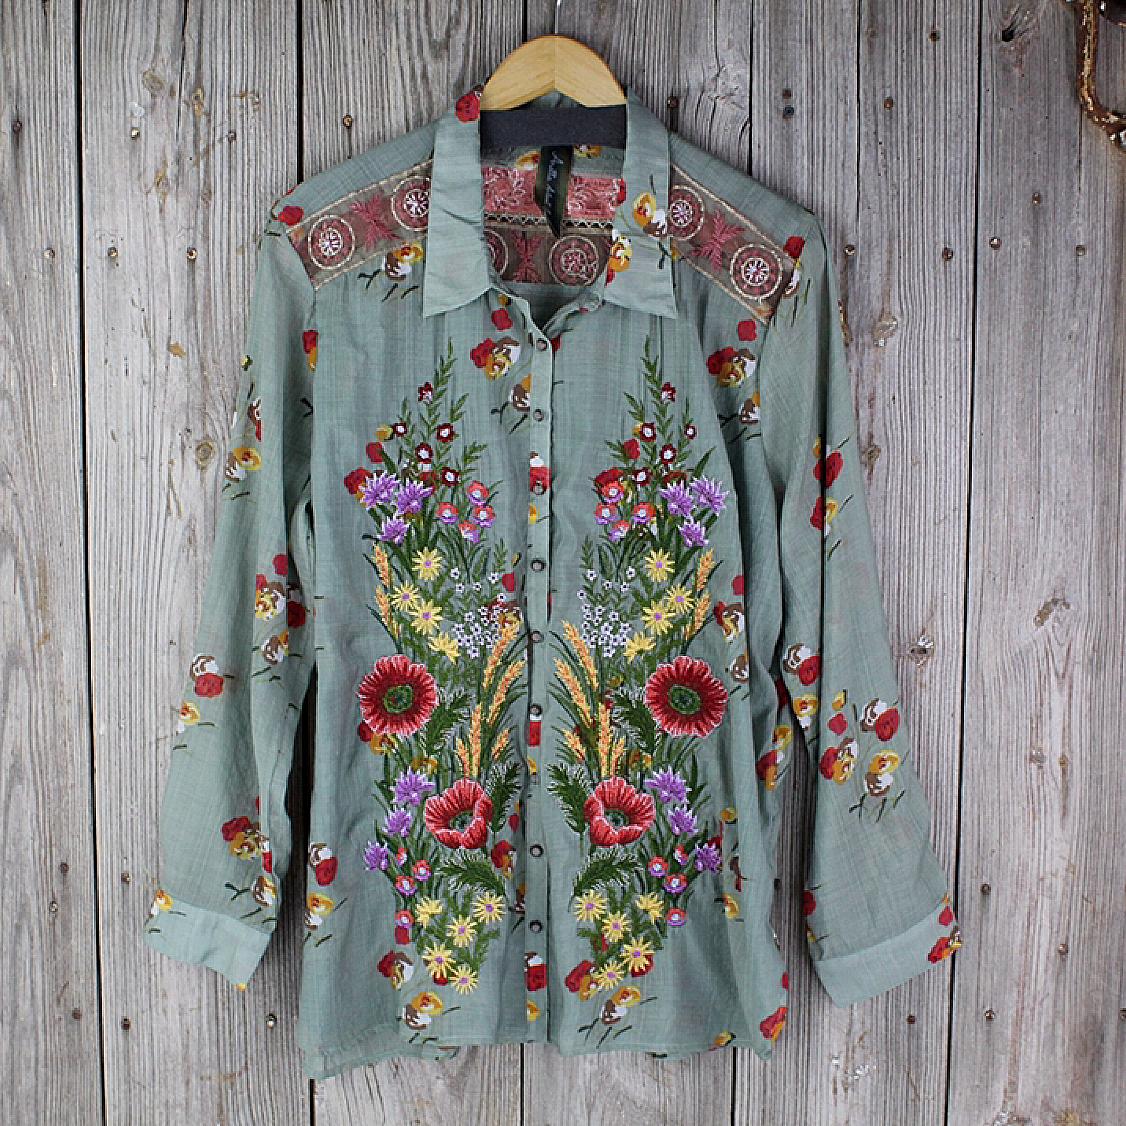 Mia Grace Shirt from Aratta